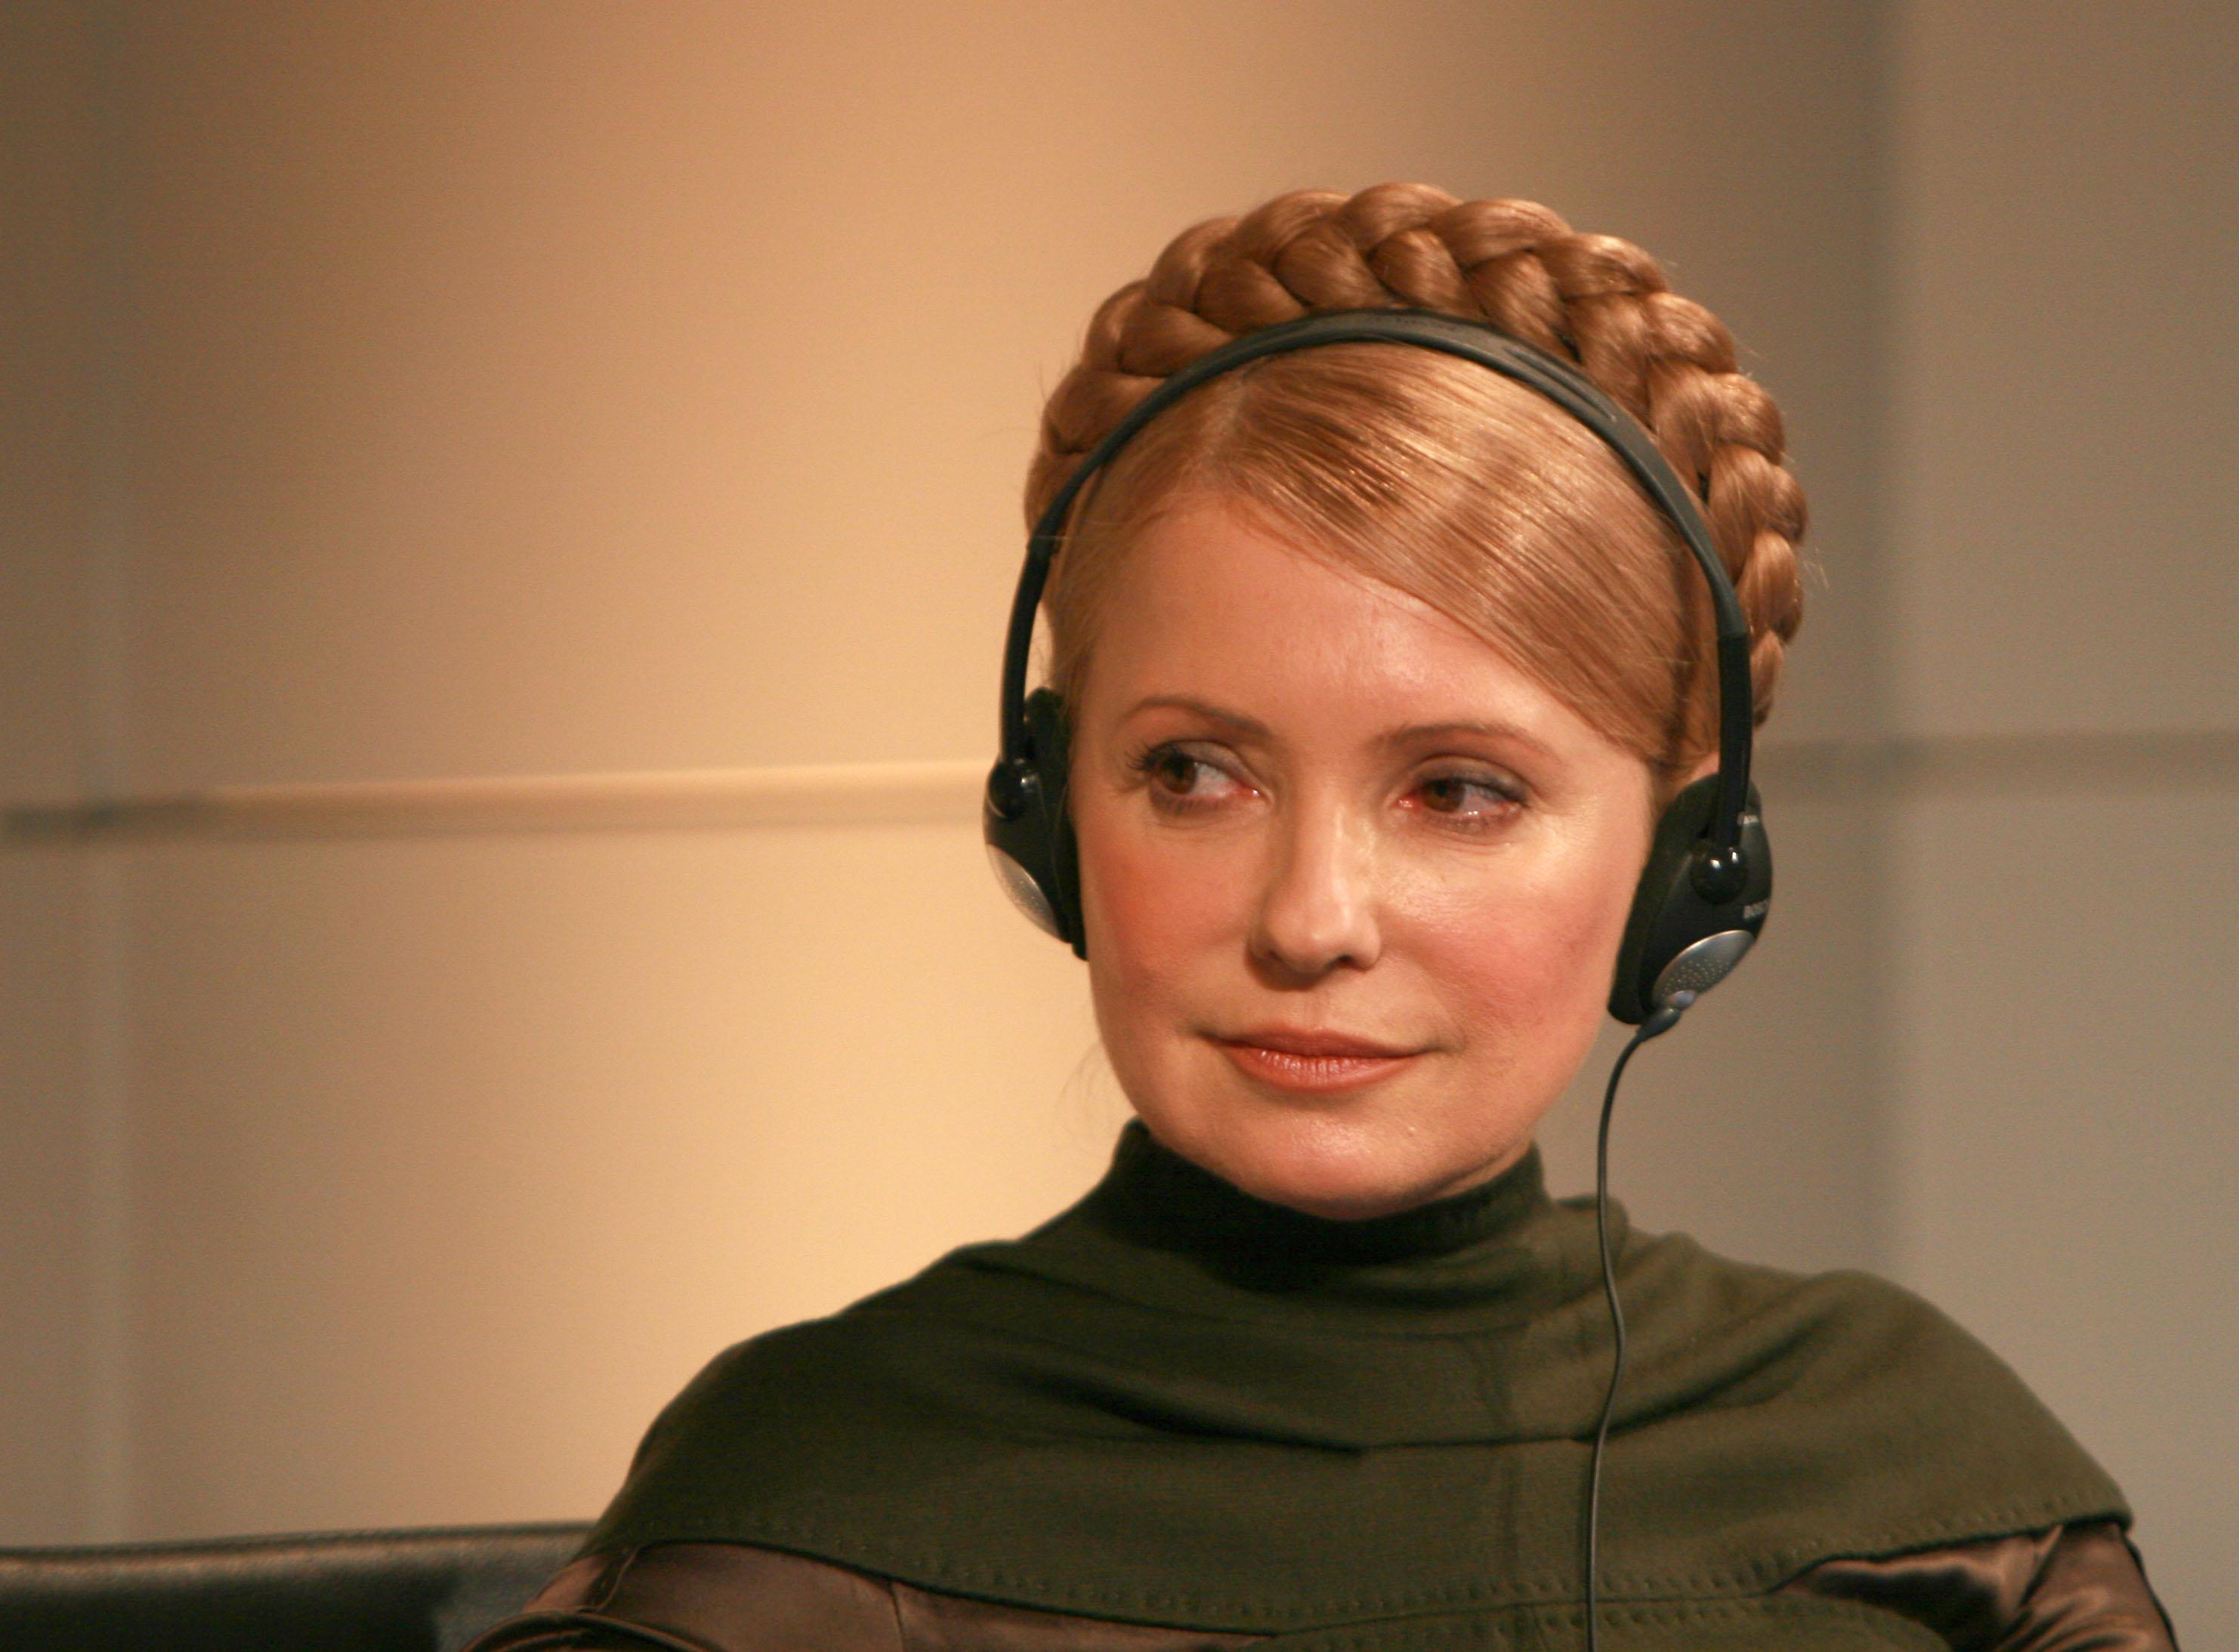 Тимошенко юлия фото 24 фотография